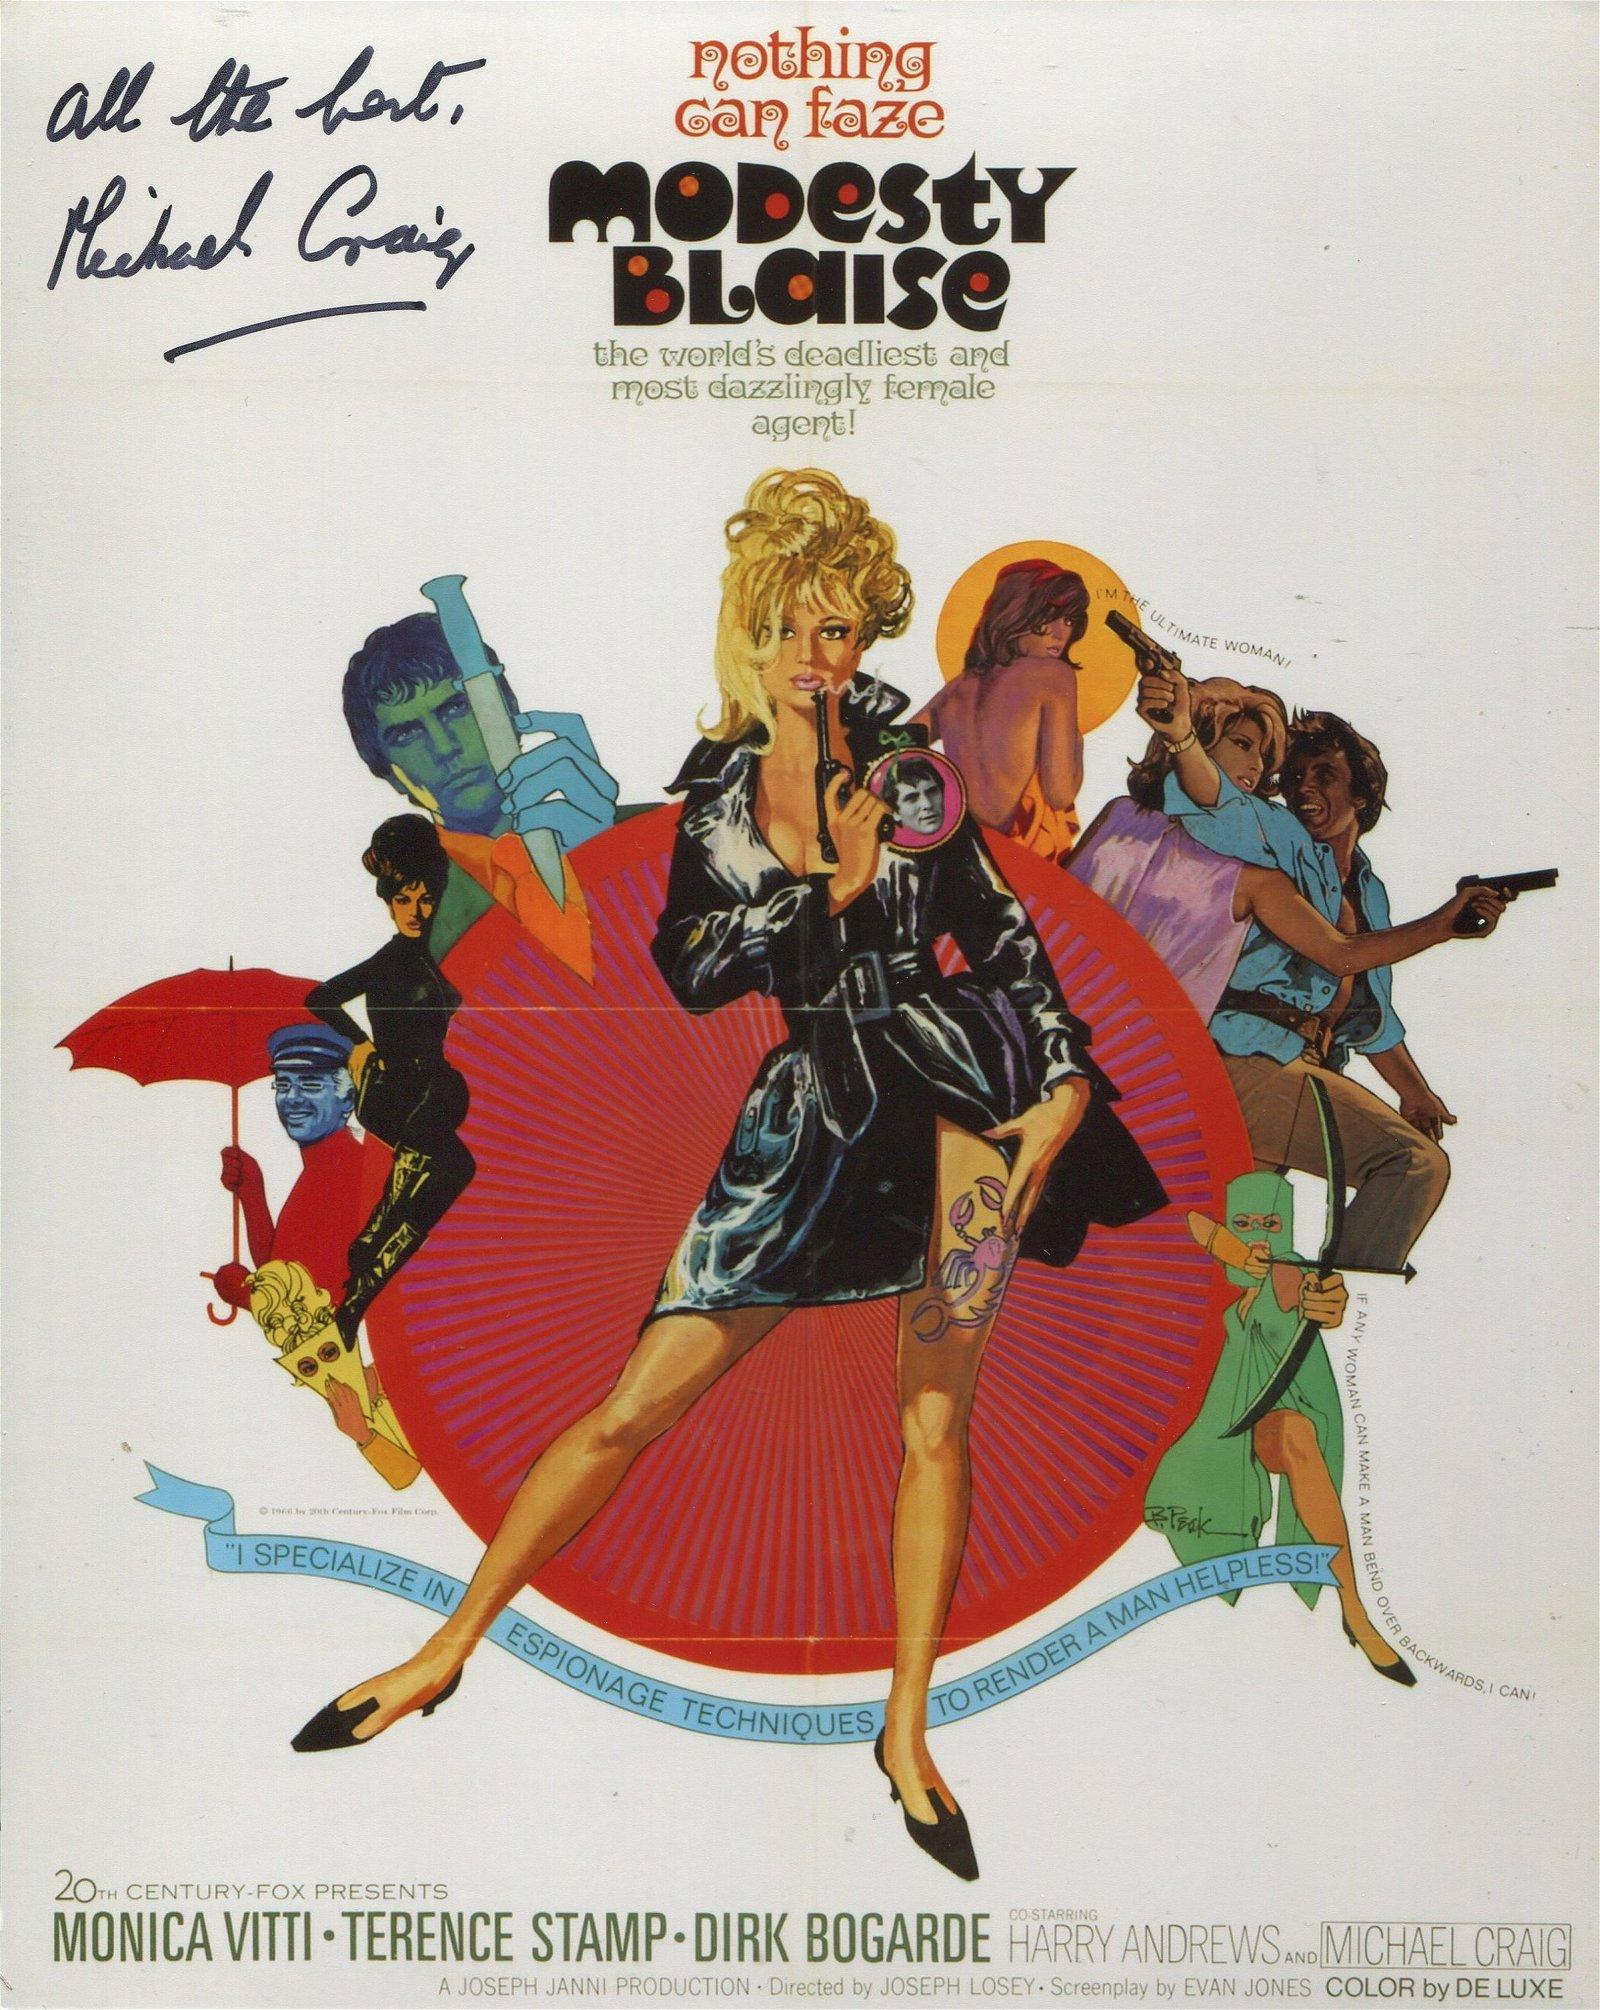 Modesty Blaise Cult 1960 s Spy Movie 8x10 Photo Signed